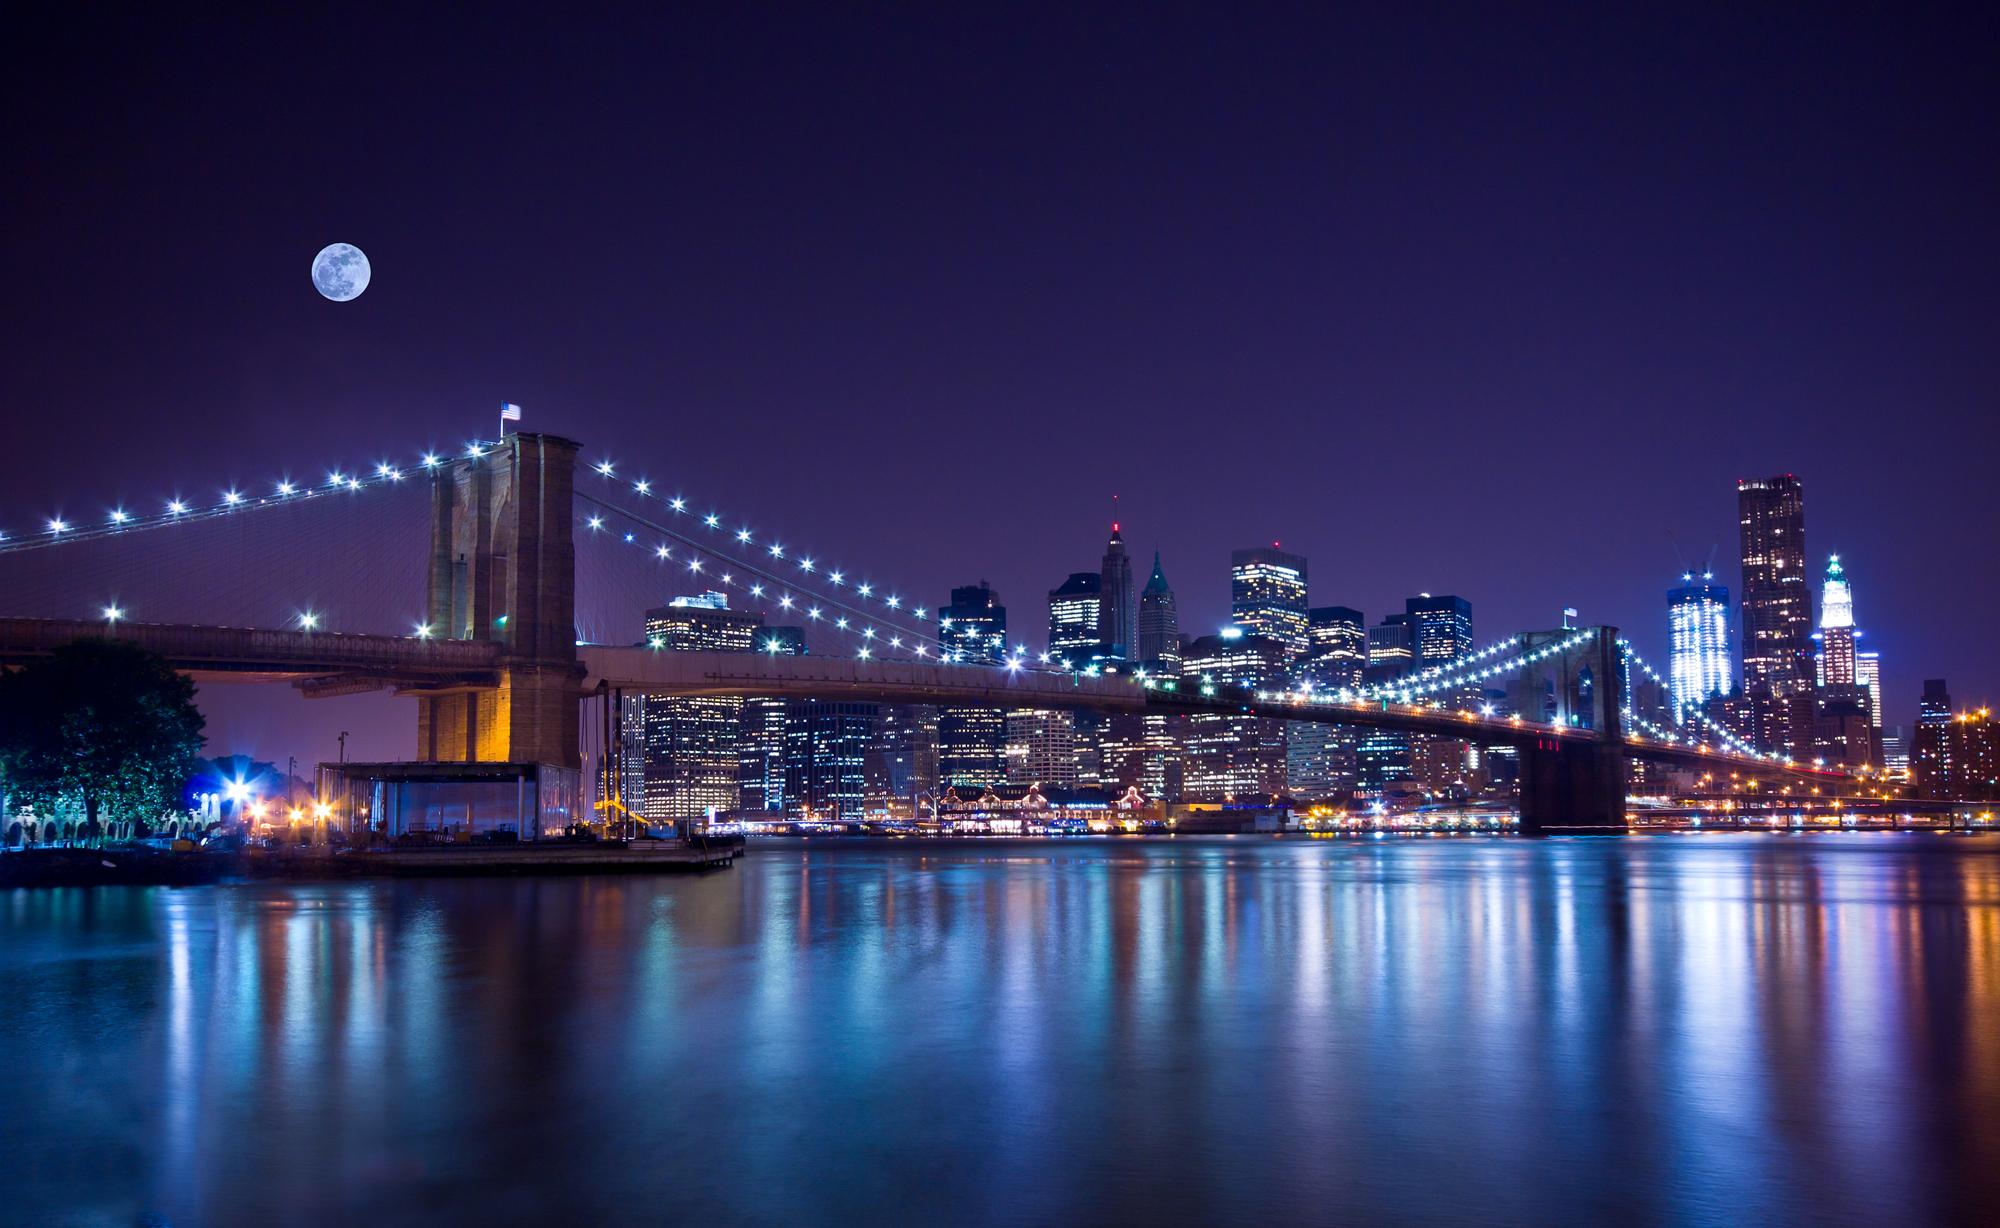 фотообои мост картинки через какое-то